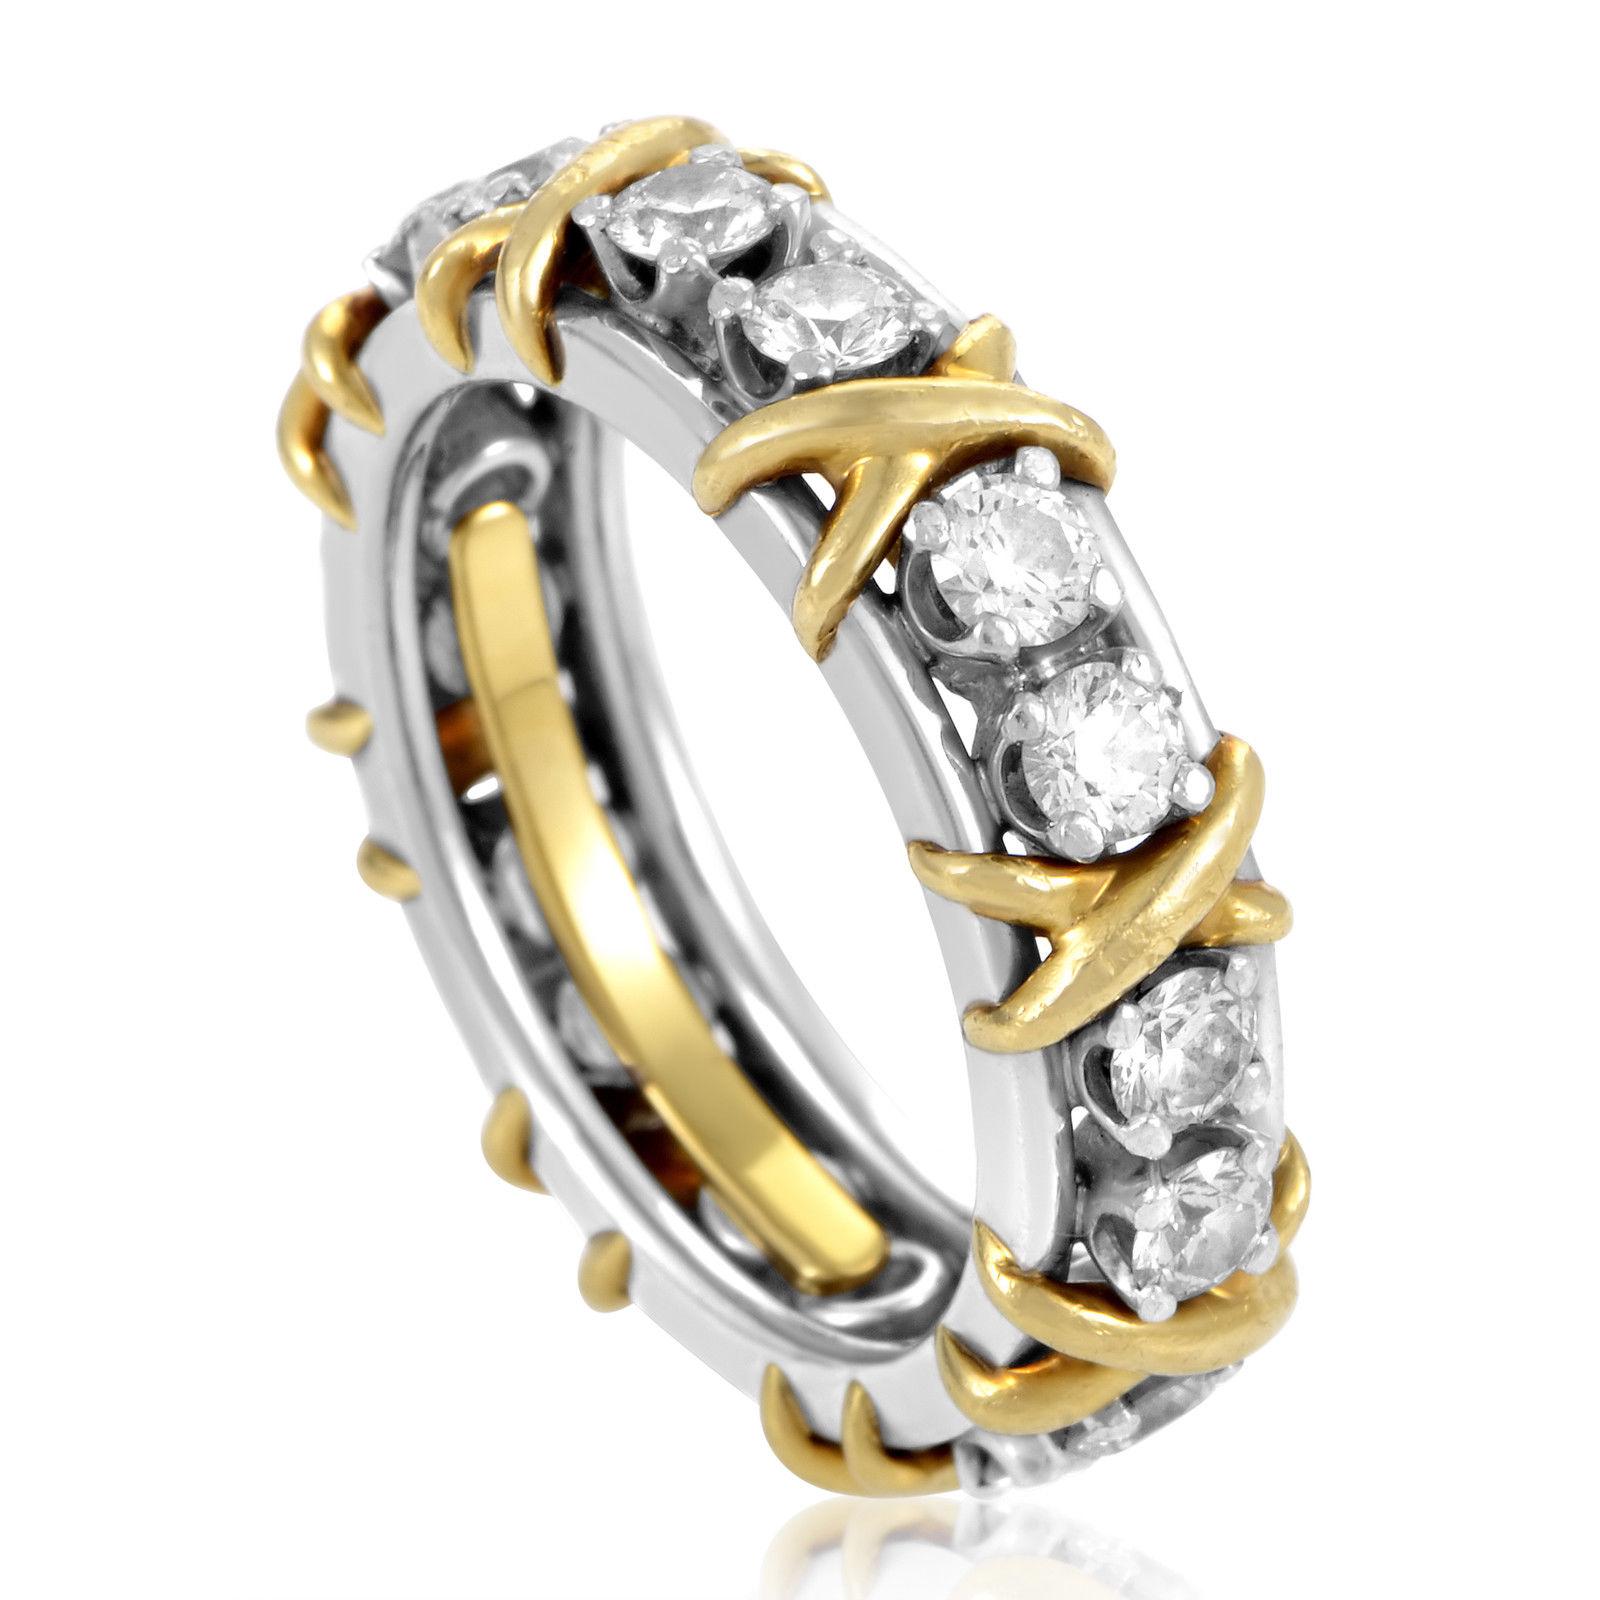 Tiffany & Co. Schlumberger Platinum & 18K Yellow Gold Diamond Eternity Band Ring.